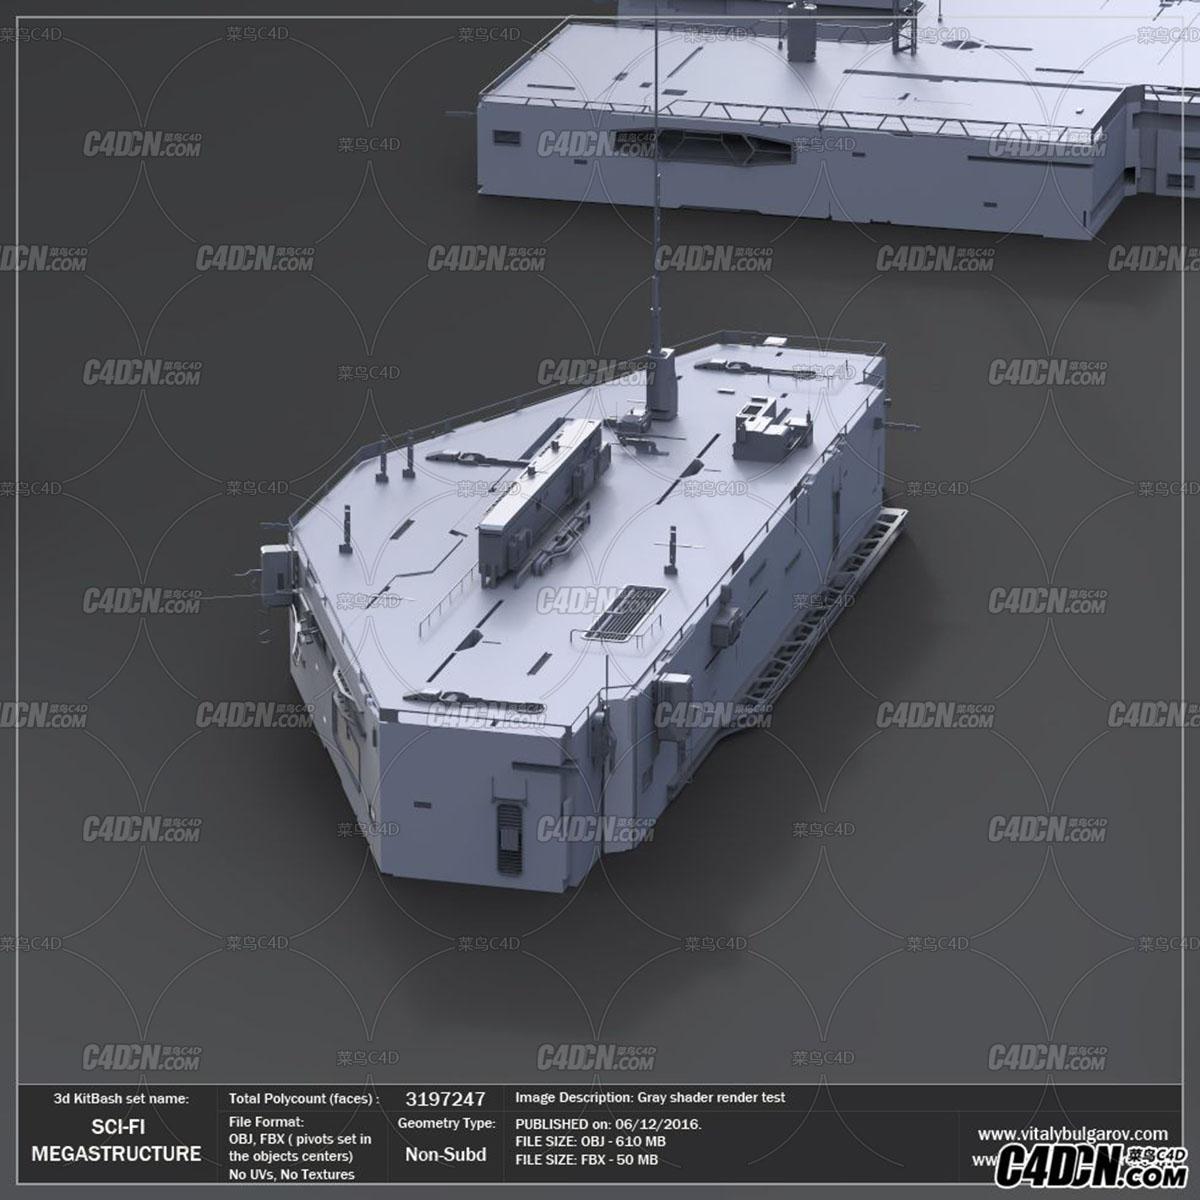 Megastructure_33.jpg